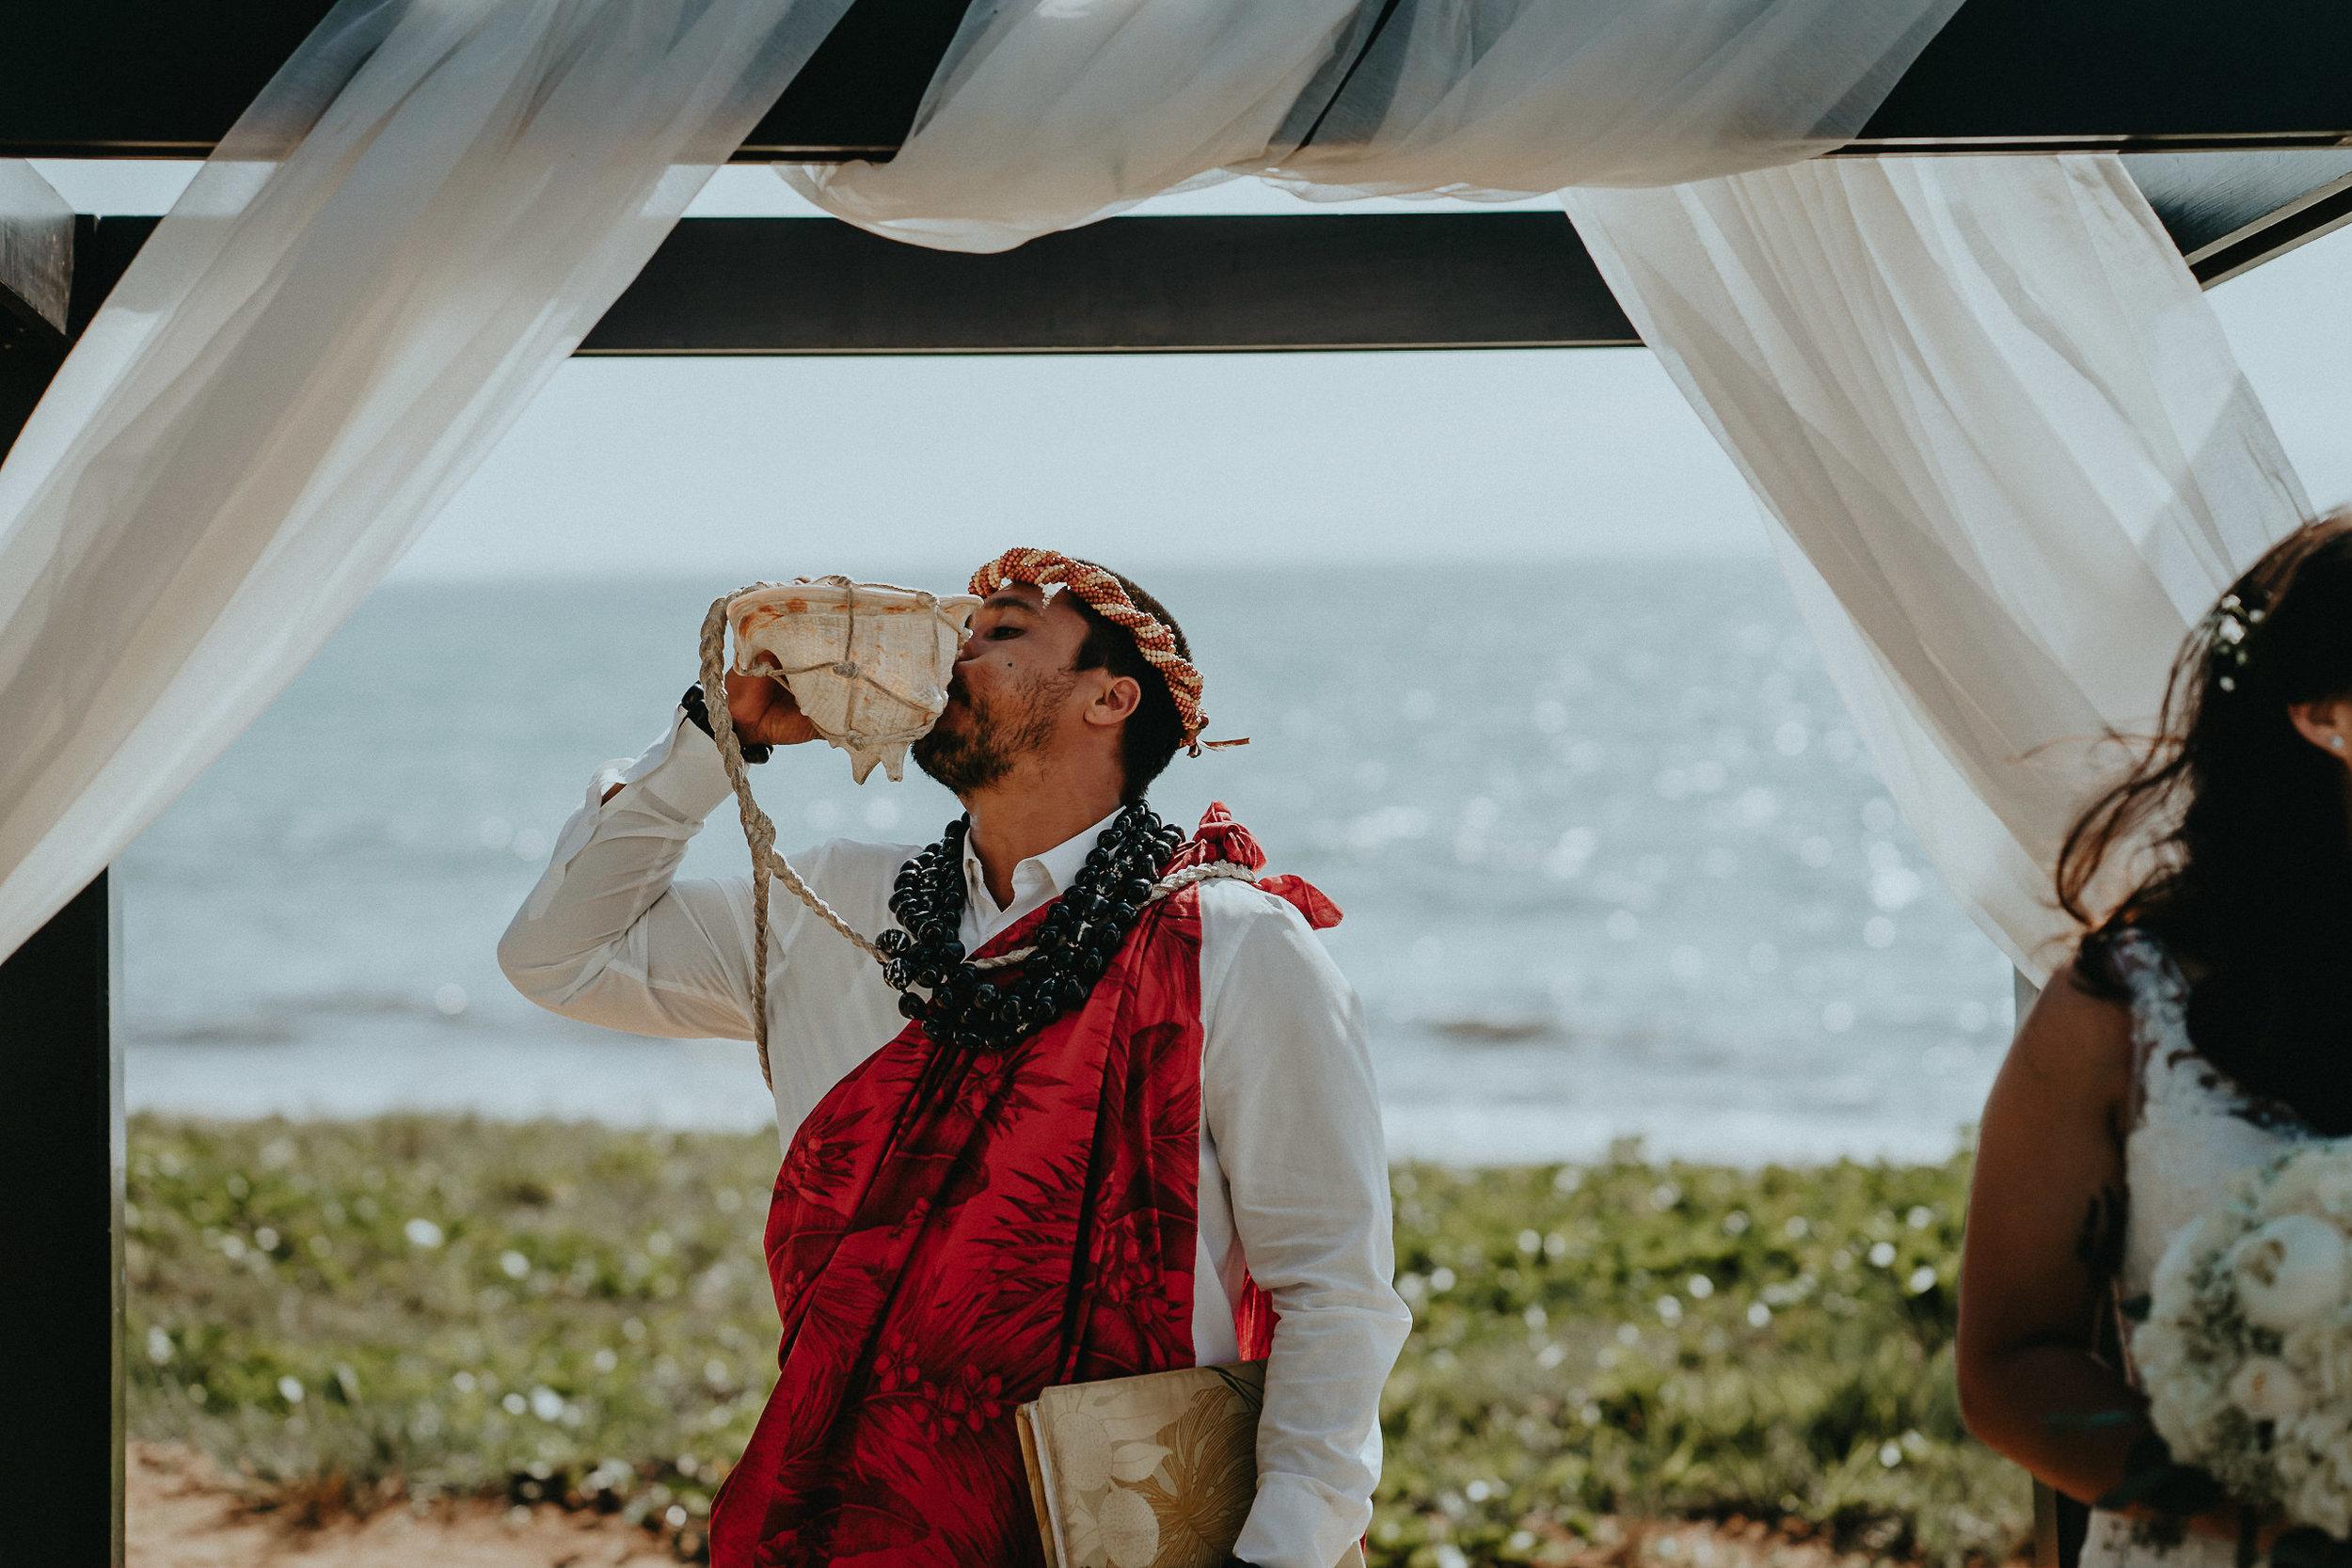 Maui_Destination_wedding_Alfred_Tang-07381.jpg